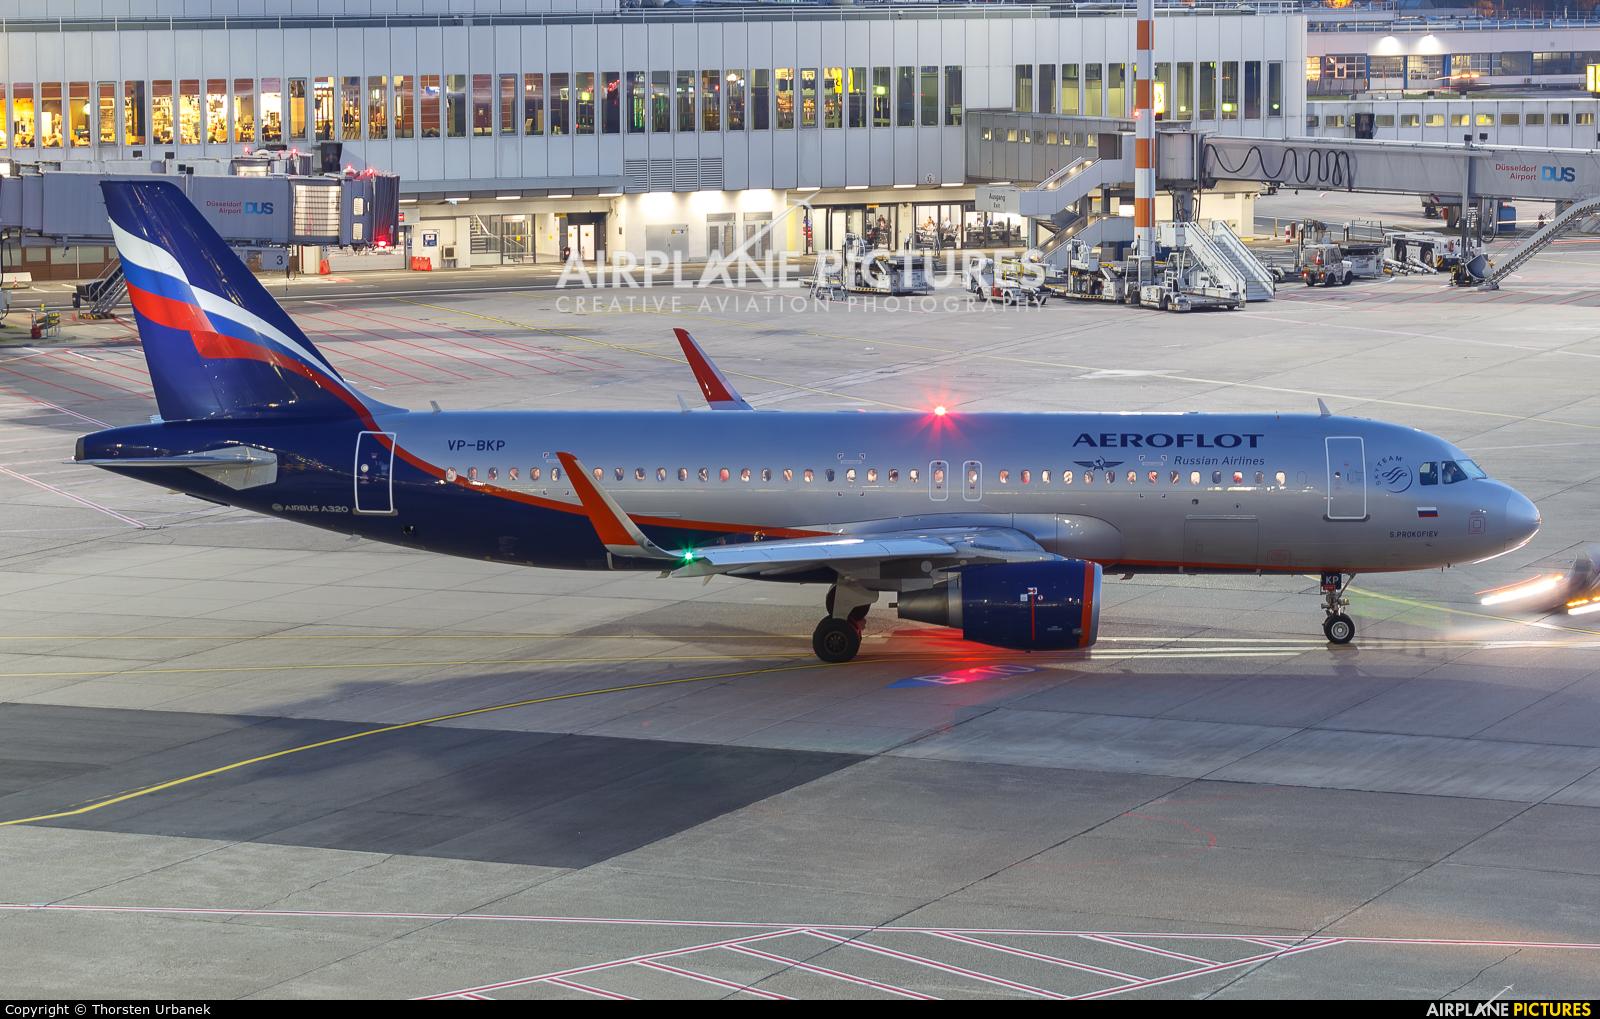 Aeroflot VP-BKP aircraft at Düsseldorf